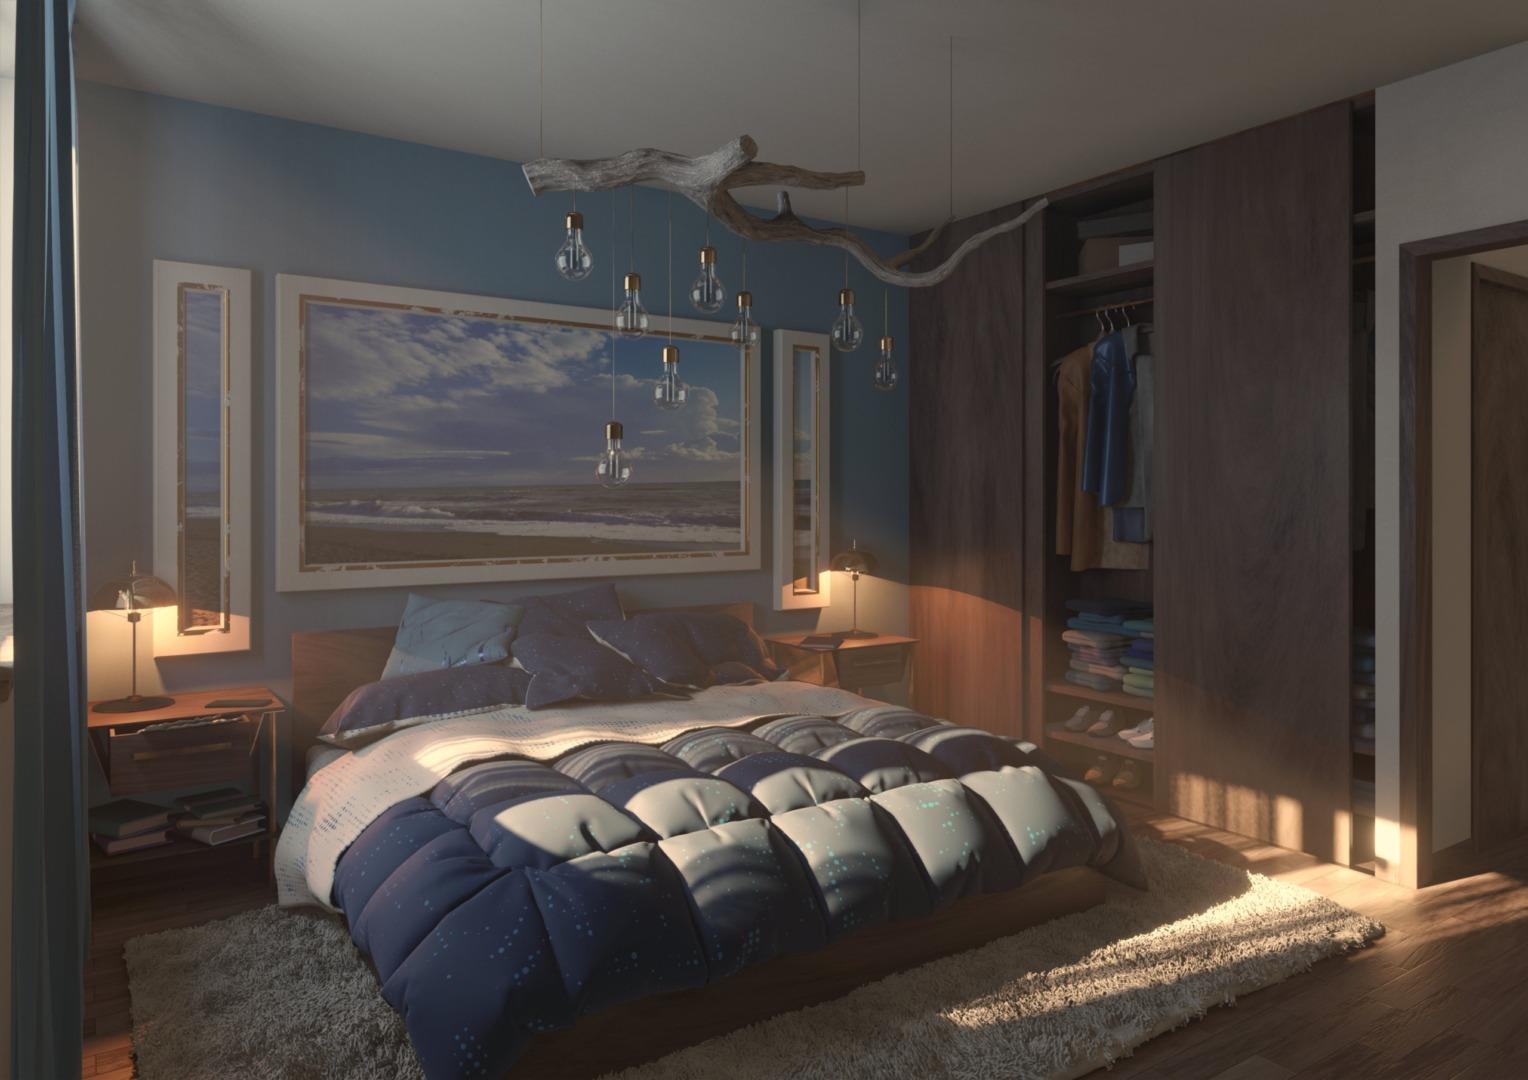 eevee-interior-archviz-commission-warm-version